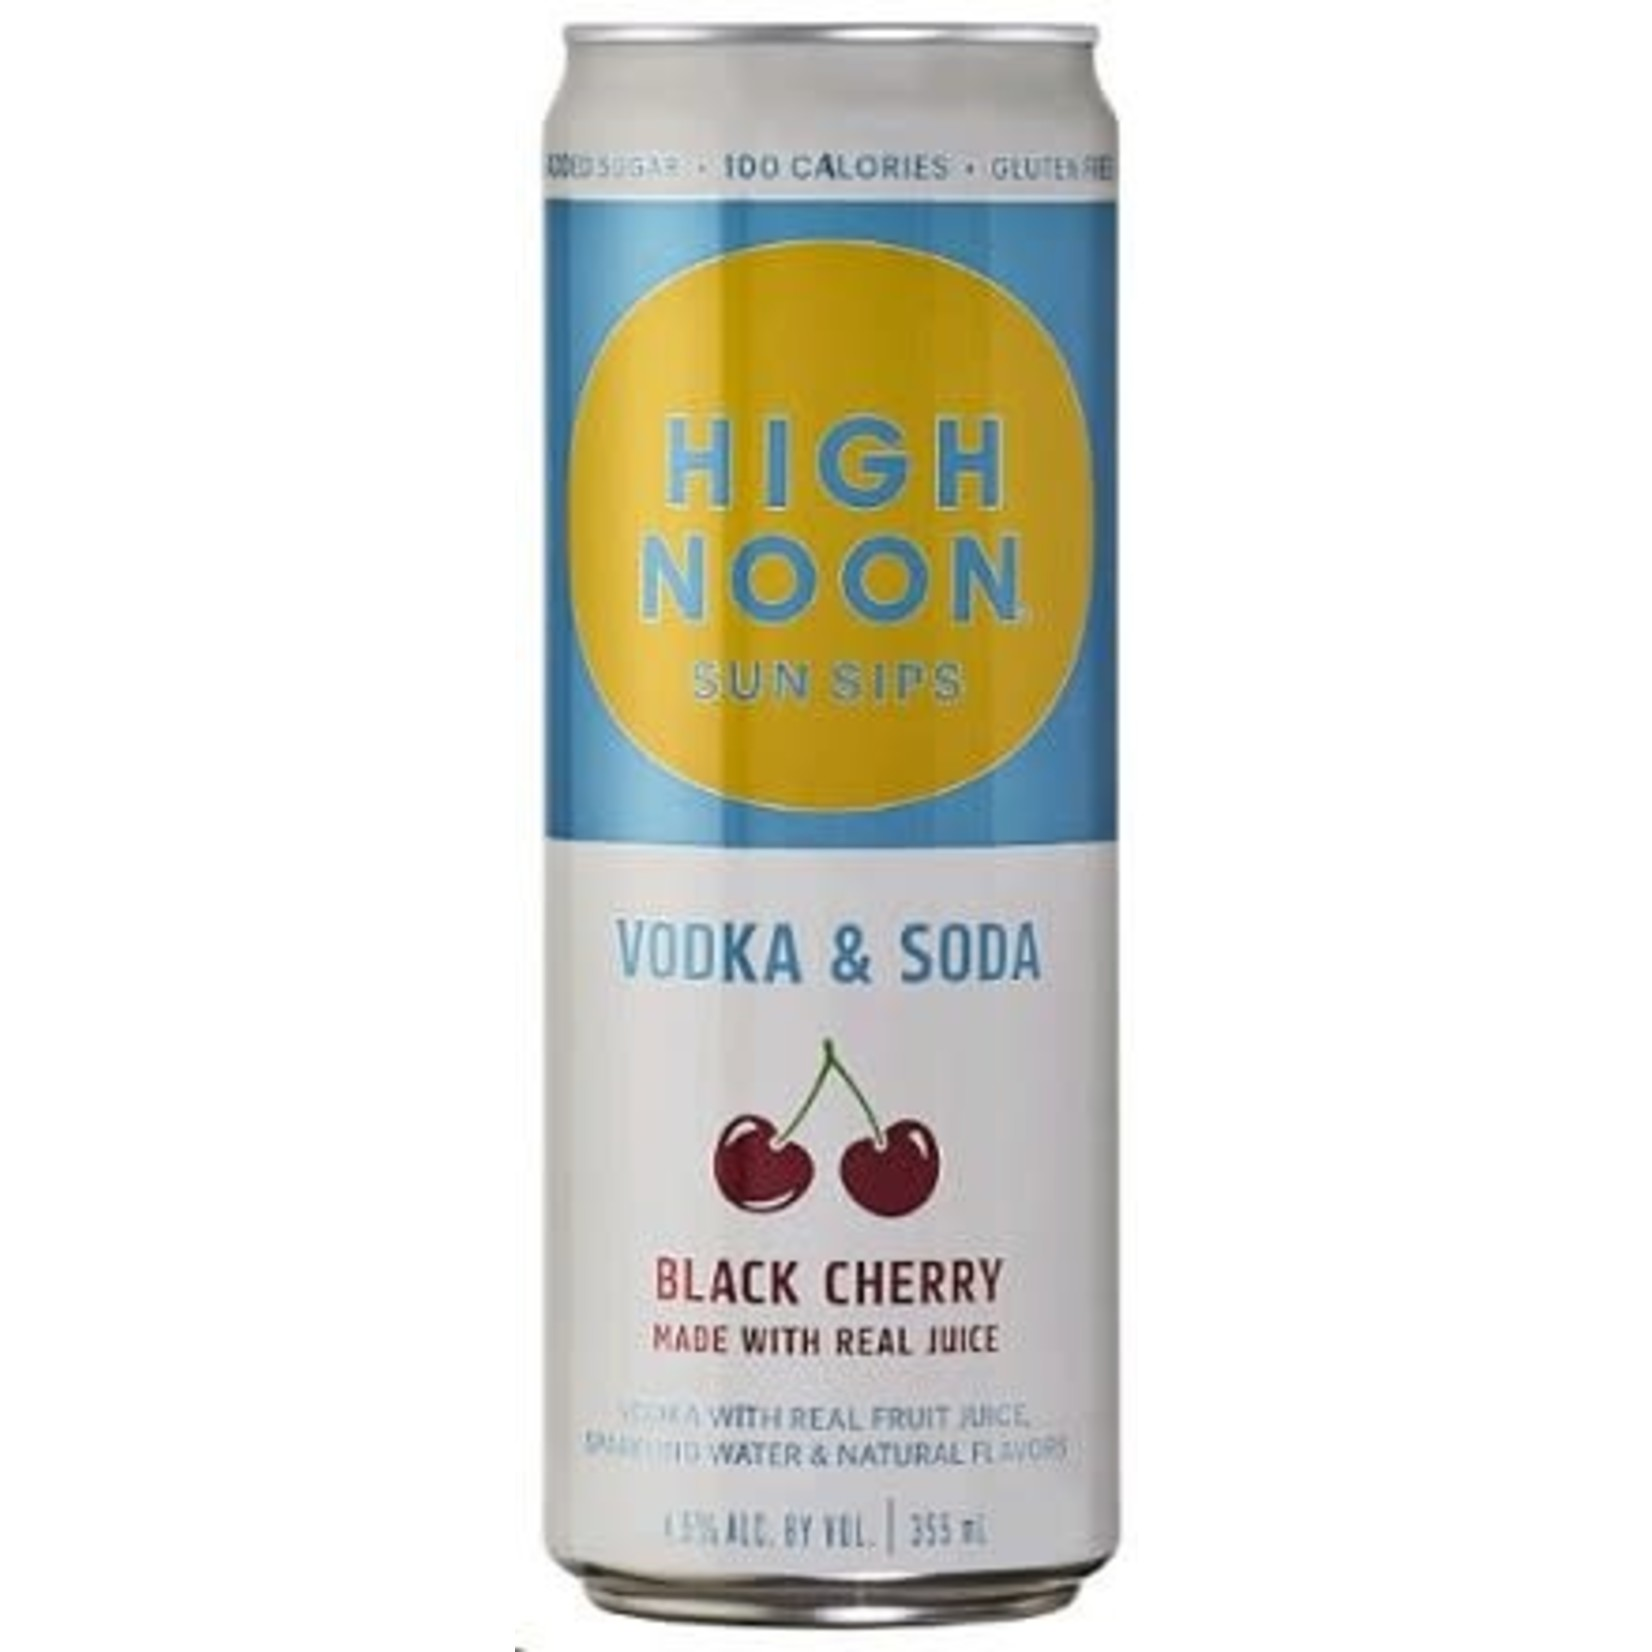 Spirits High Noon Sun Sips Vodka & Soda Black Cherry 355 ml Cans